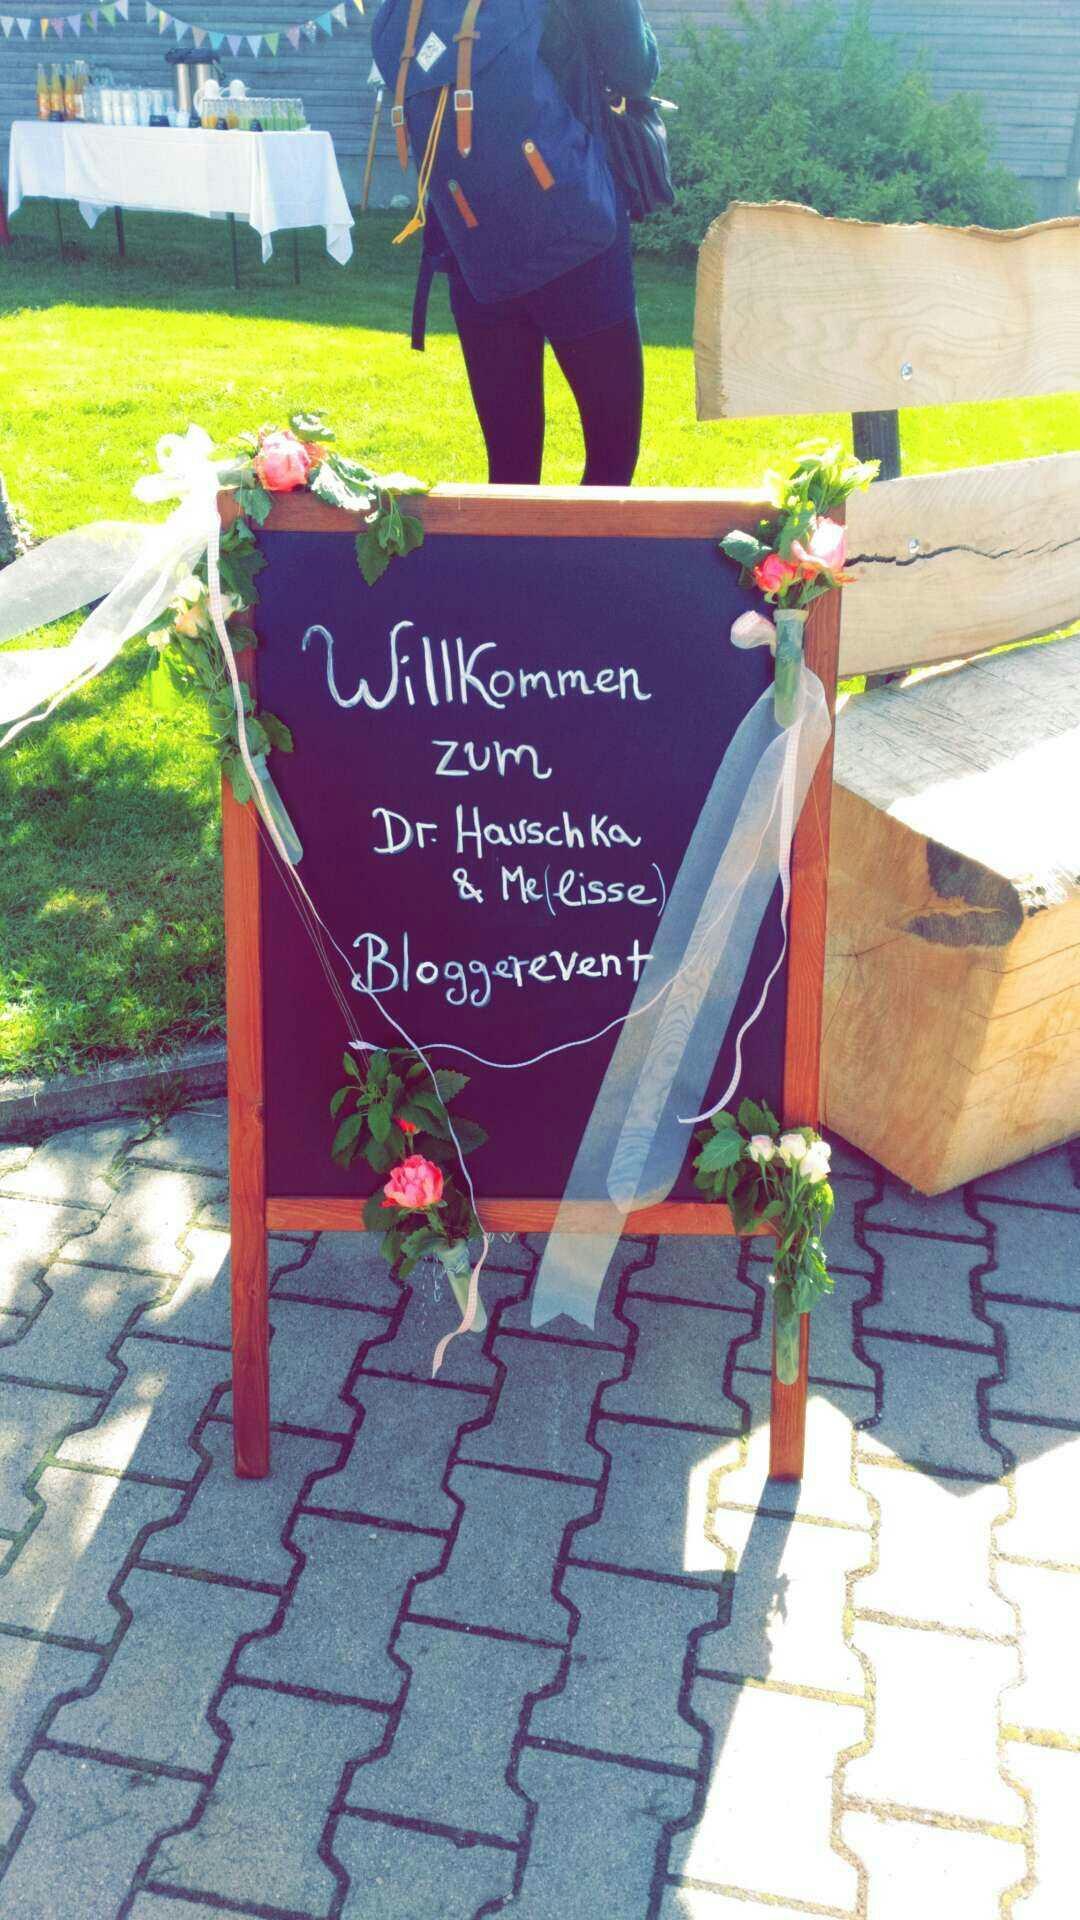 Dr. Hauschka_Sonnenhof_Bad Boll_Demeter Hof_Hauschka_Naturpflege_Annanikabu (6)